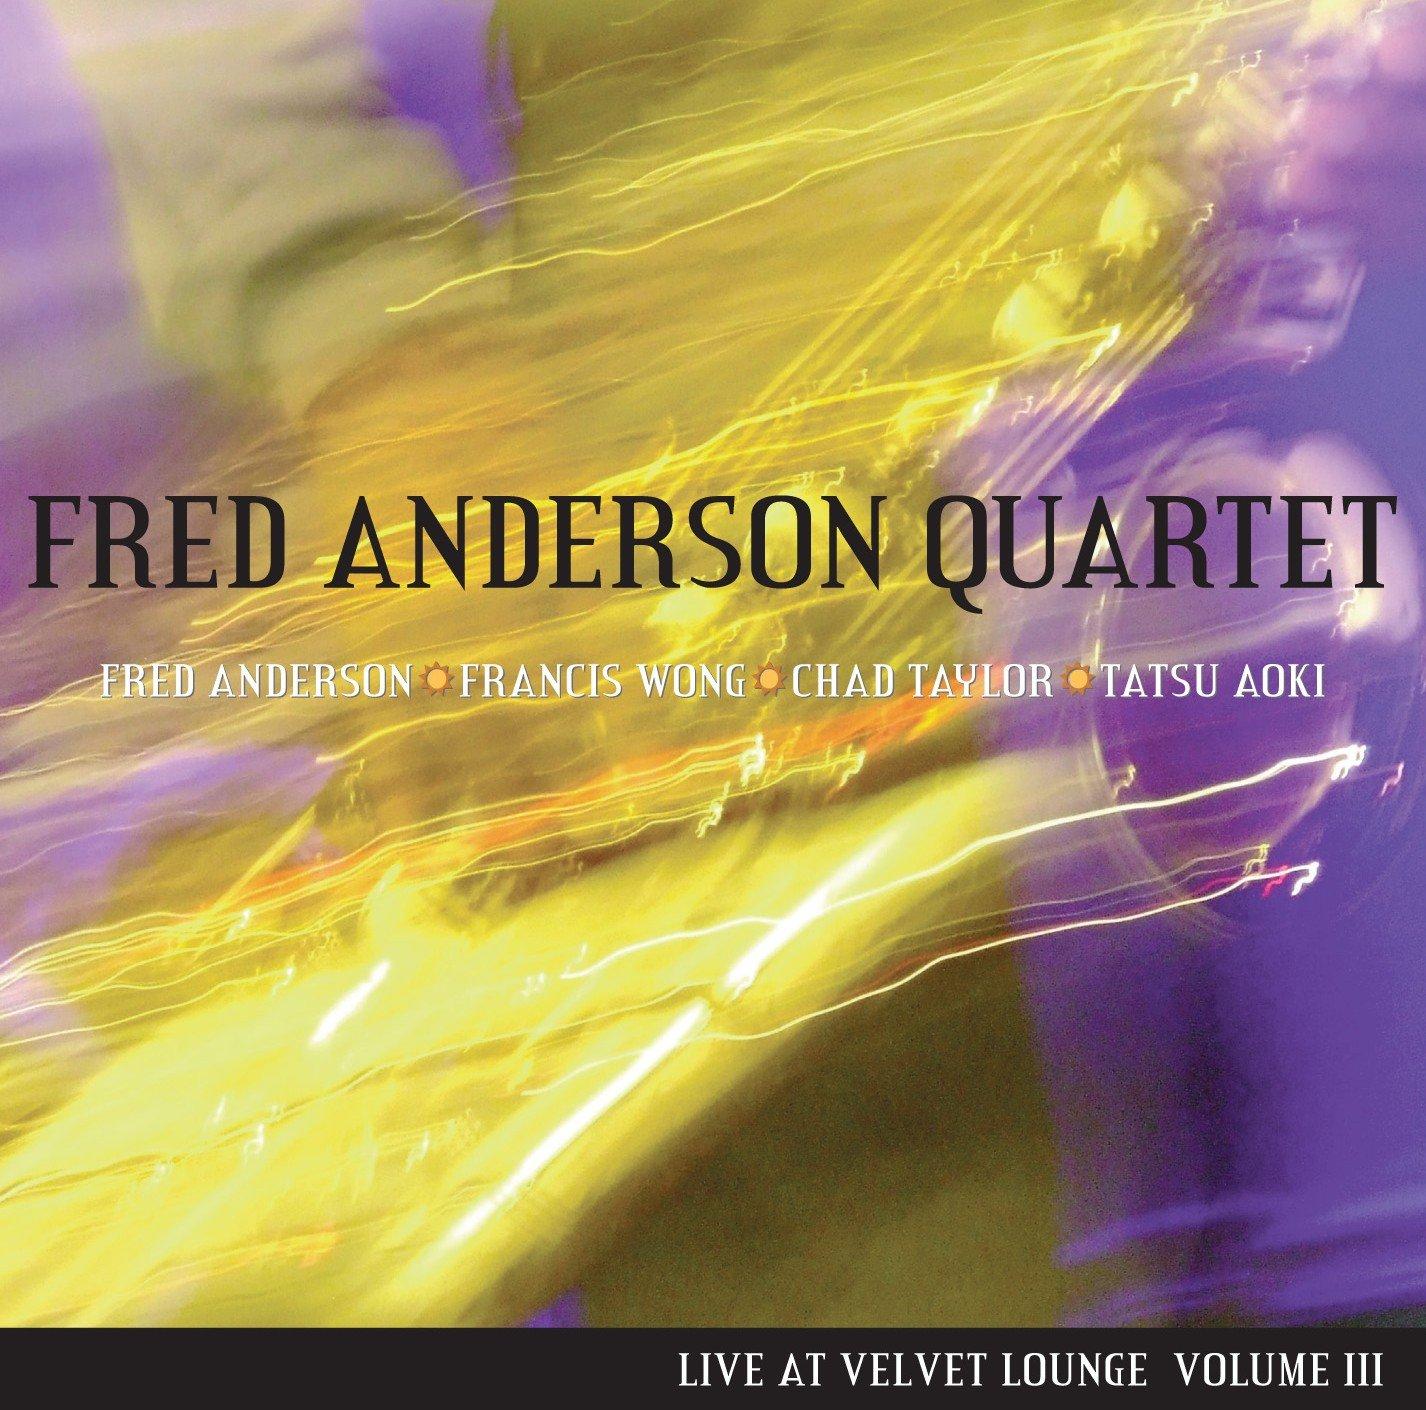 Fred Anderson Quartet - Live at Velvet Lounge Volume III